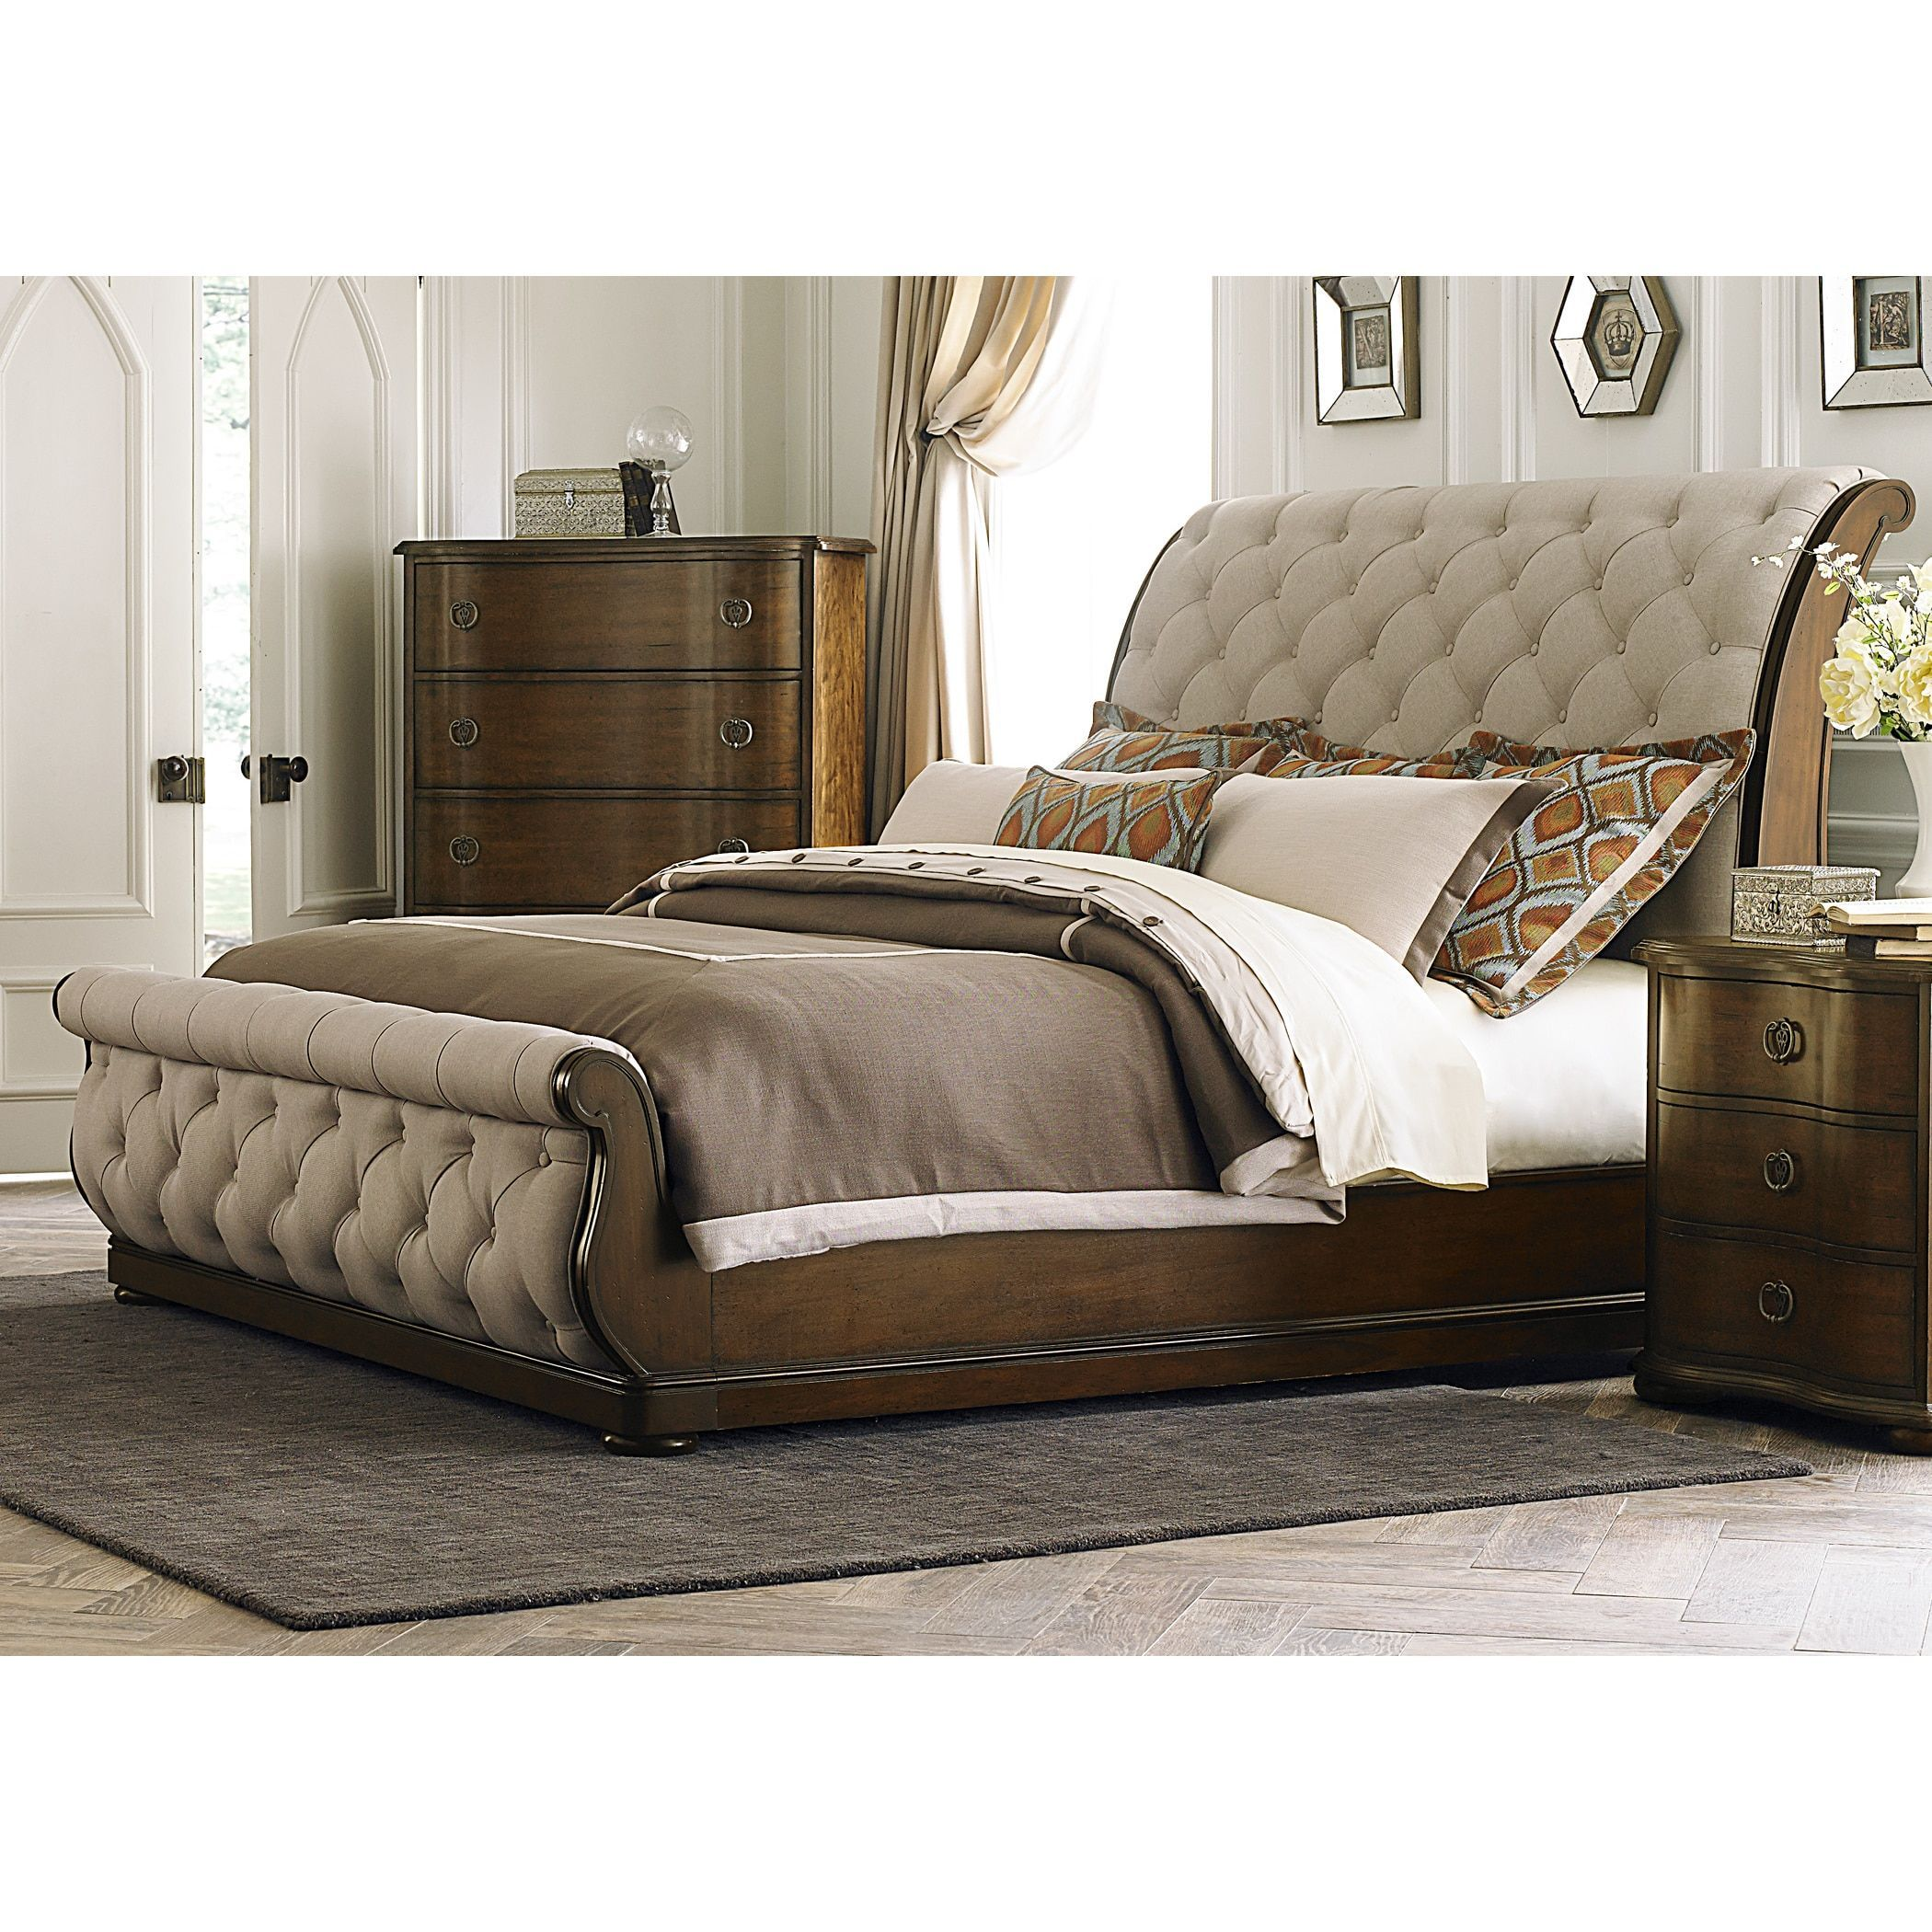 Liberty Cotsworld Tufted Linen Upholstered Sleighbed